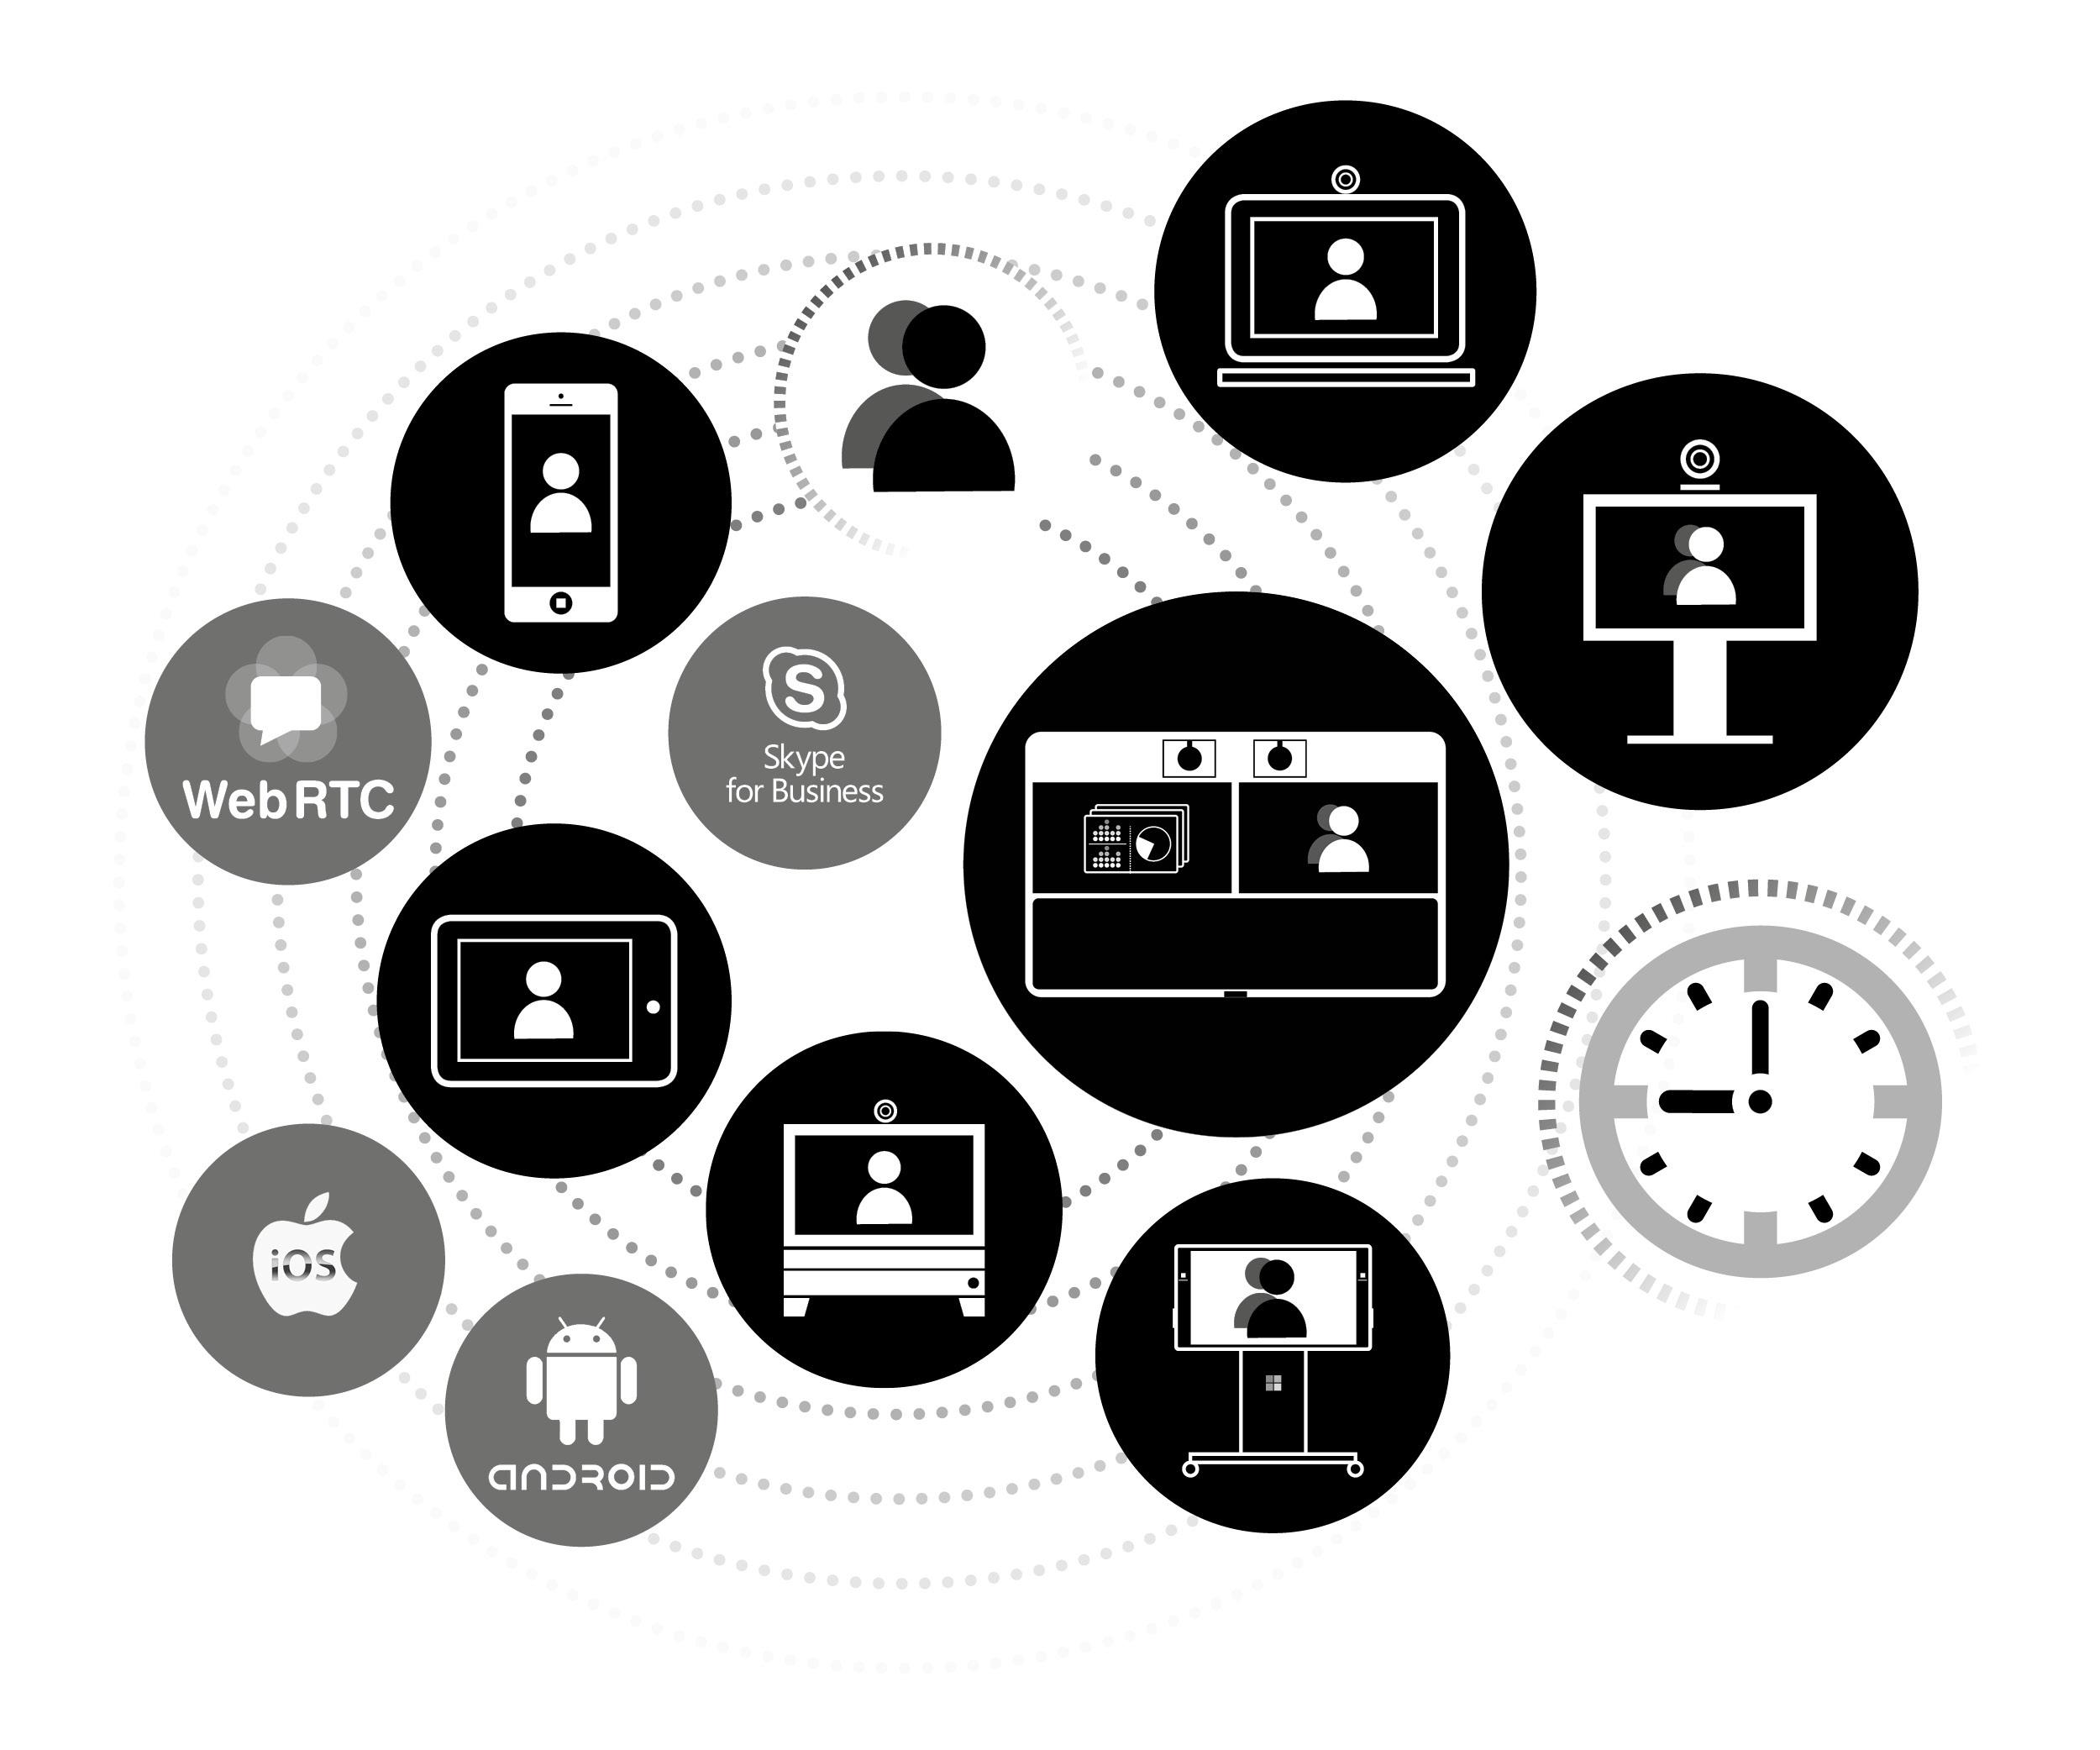 Illustration_Devices_Platforms_270716.jpg